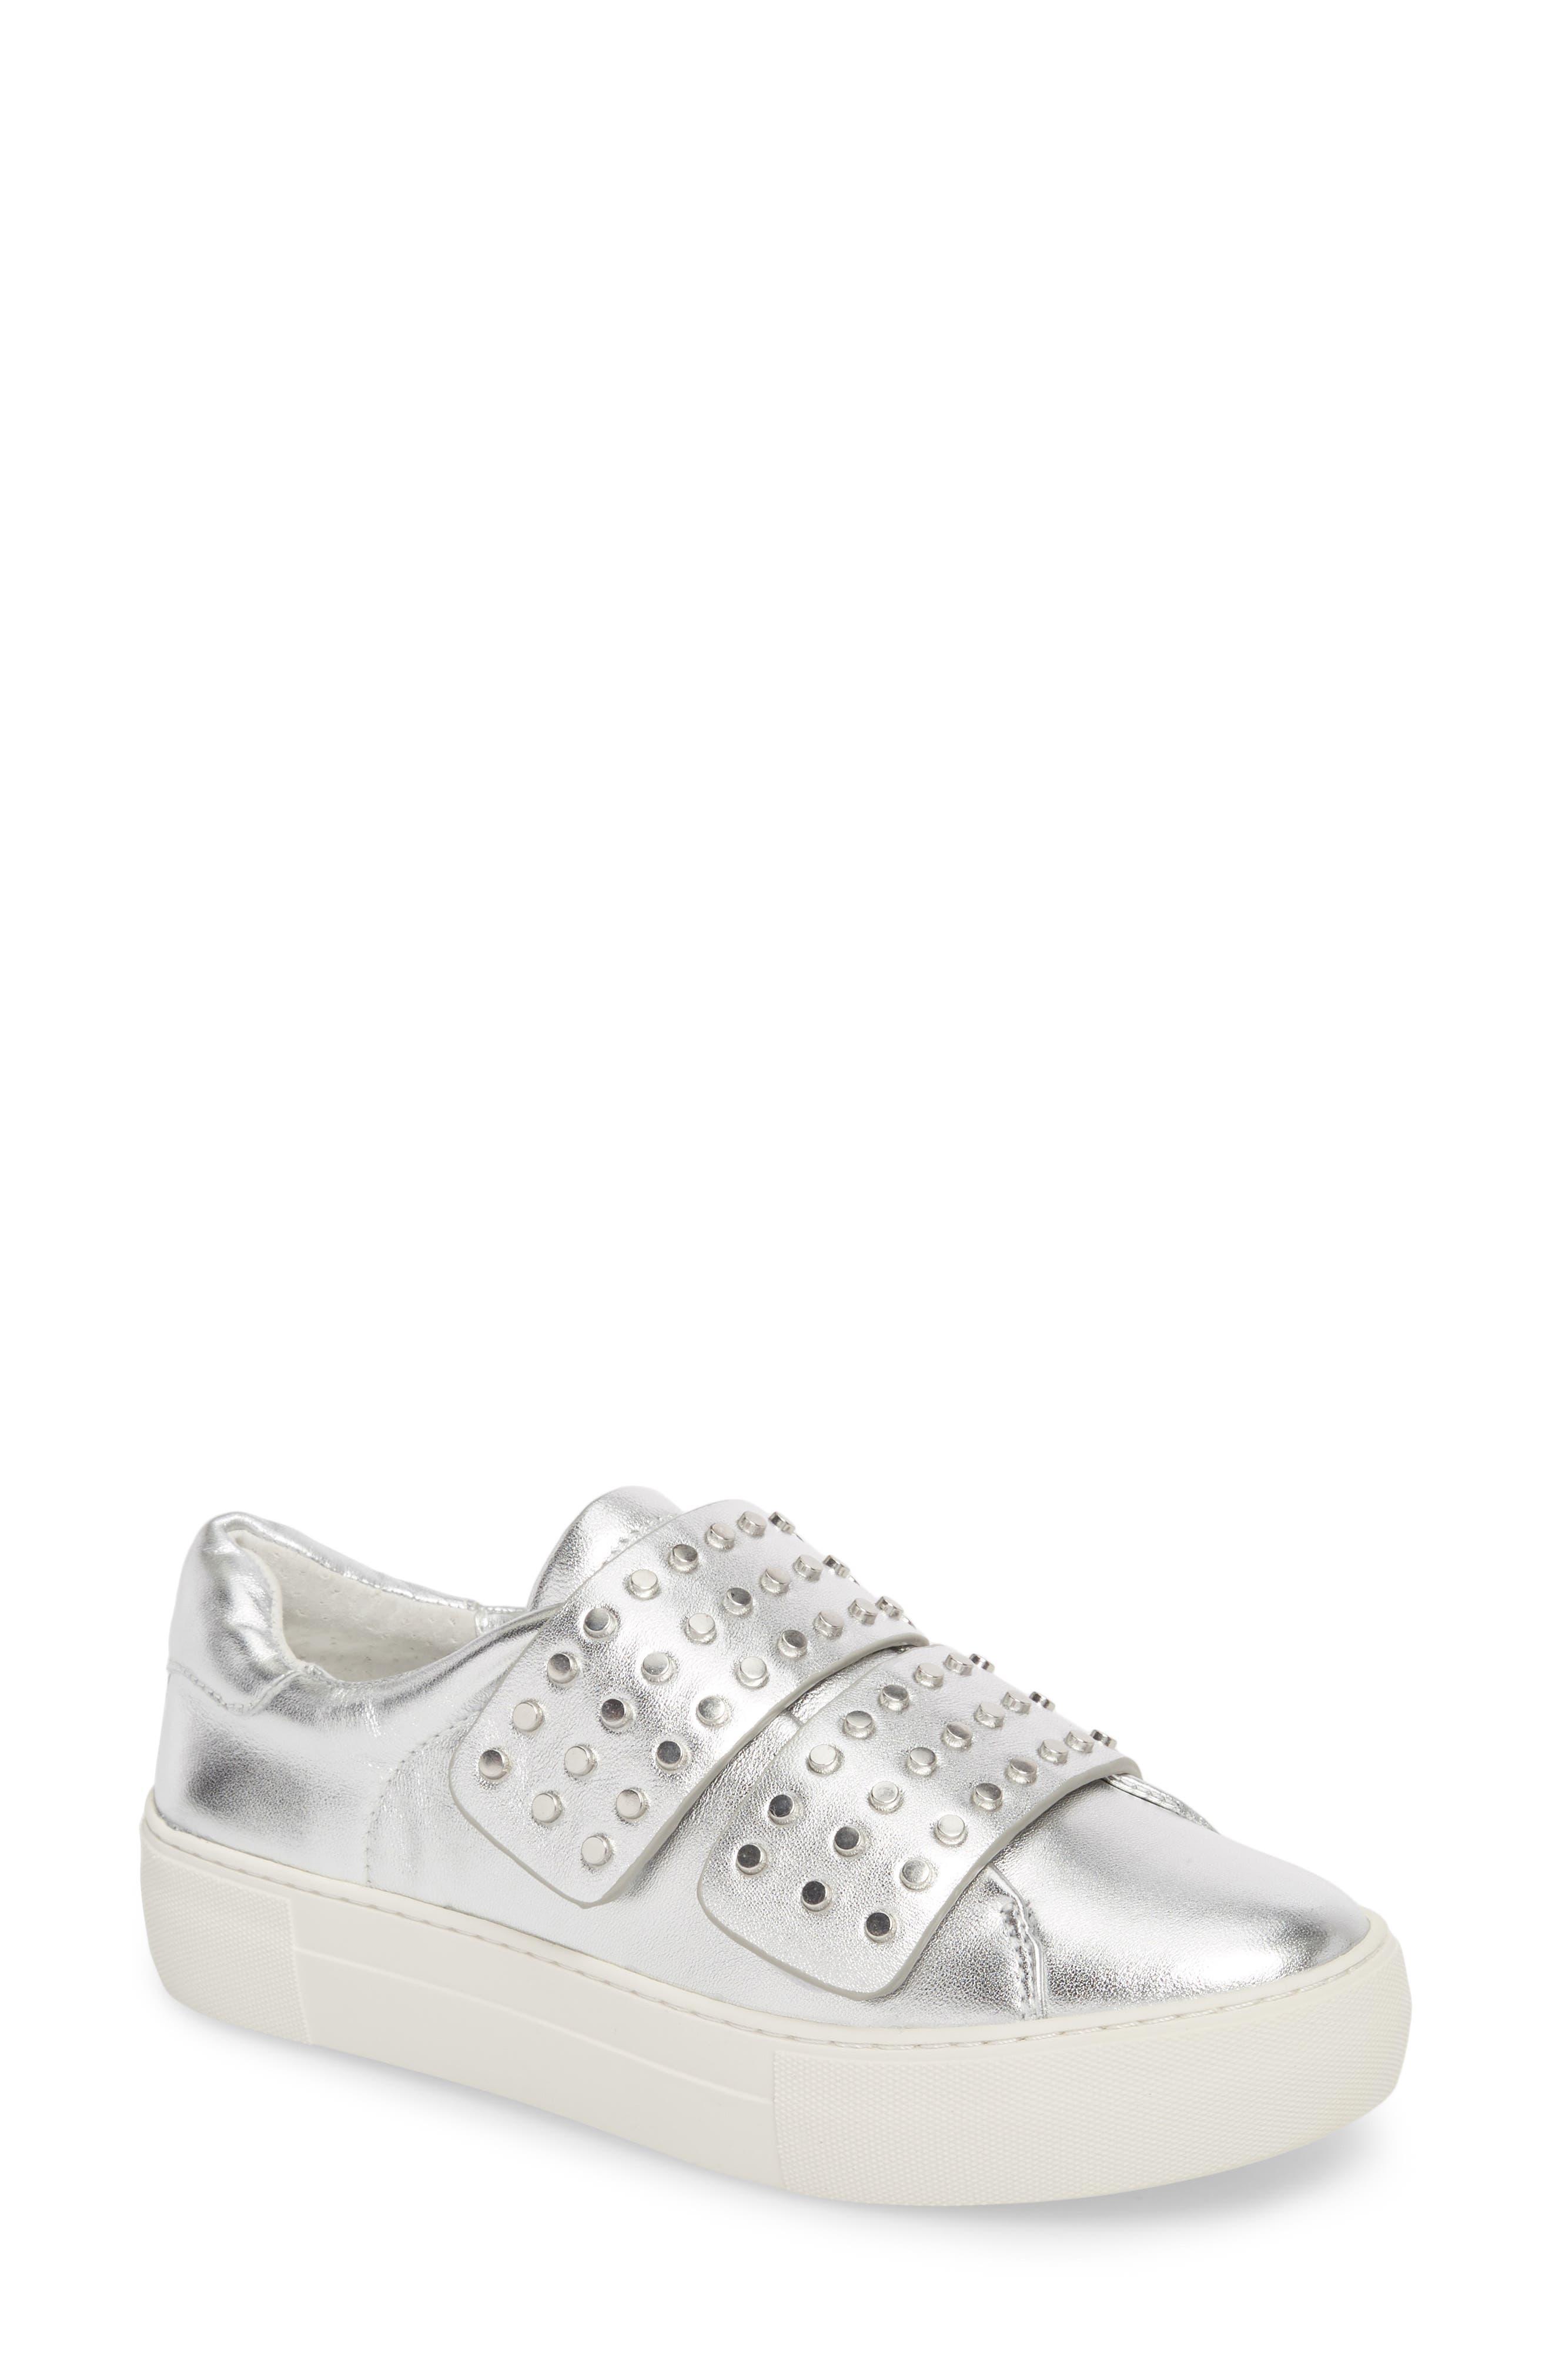 Jslides Accent Slip-On Sneaker